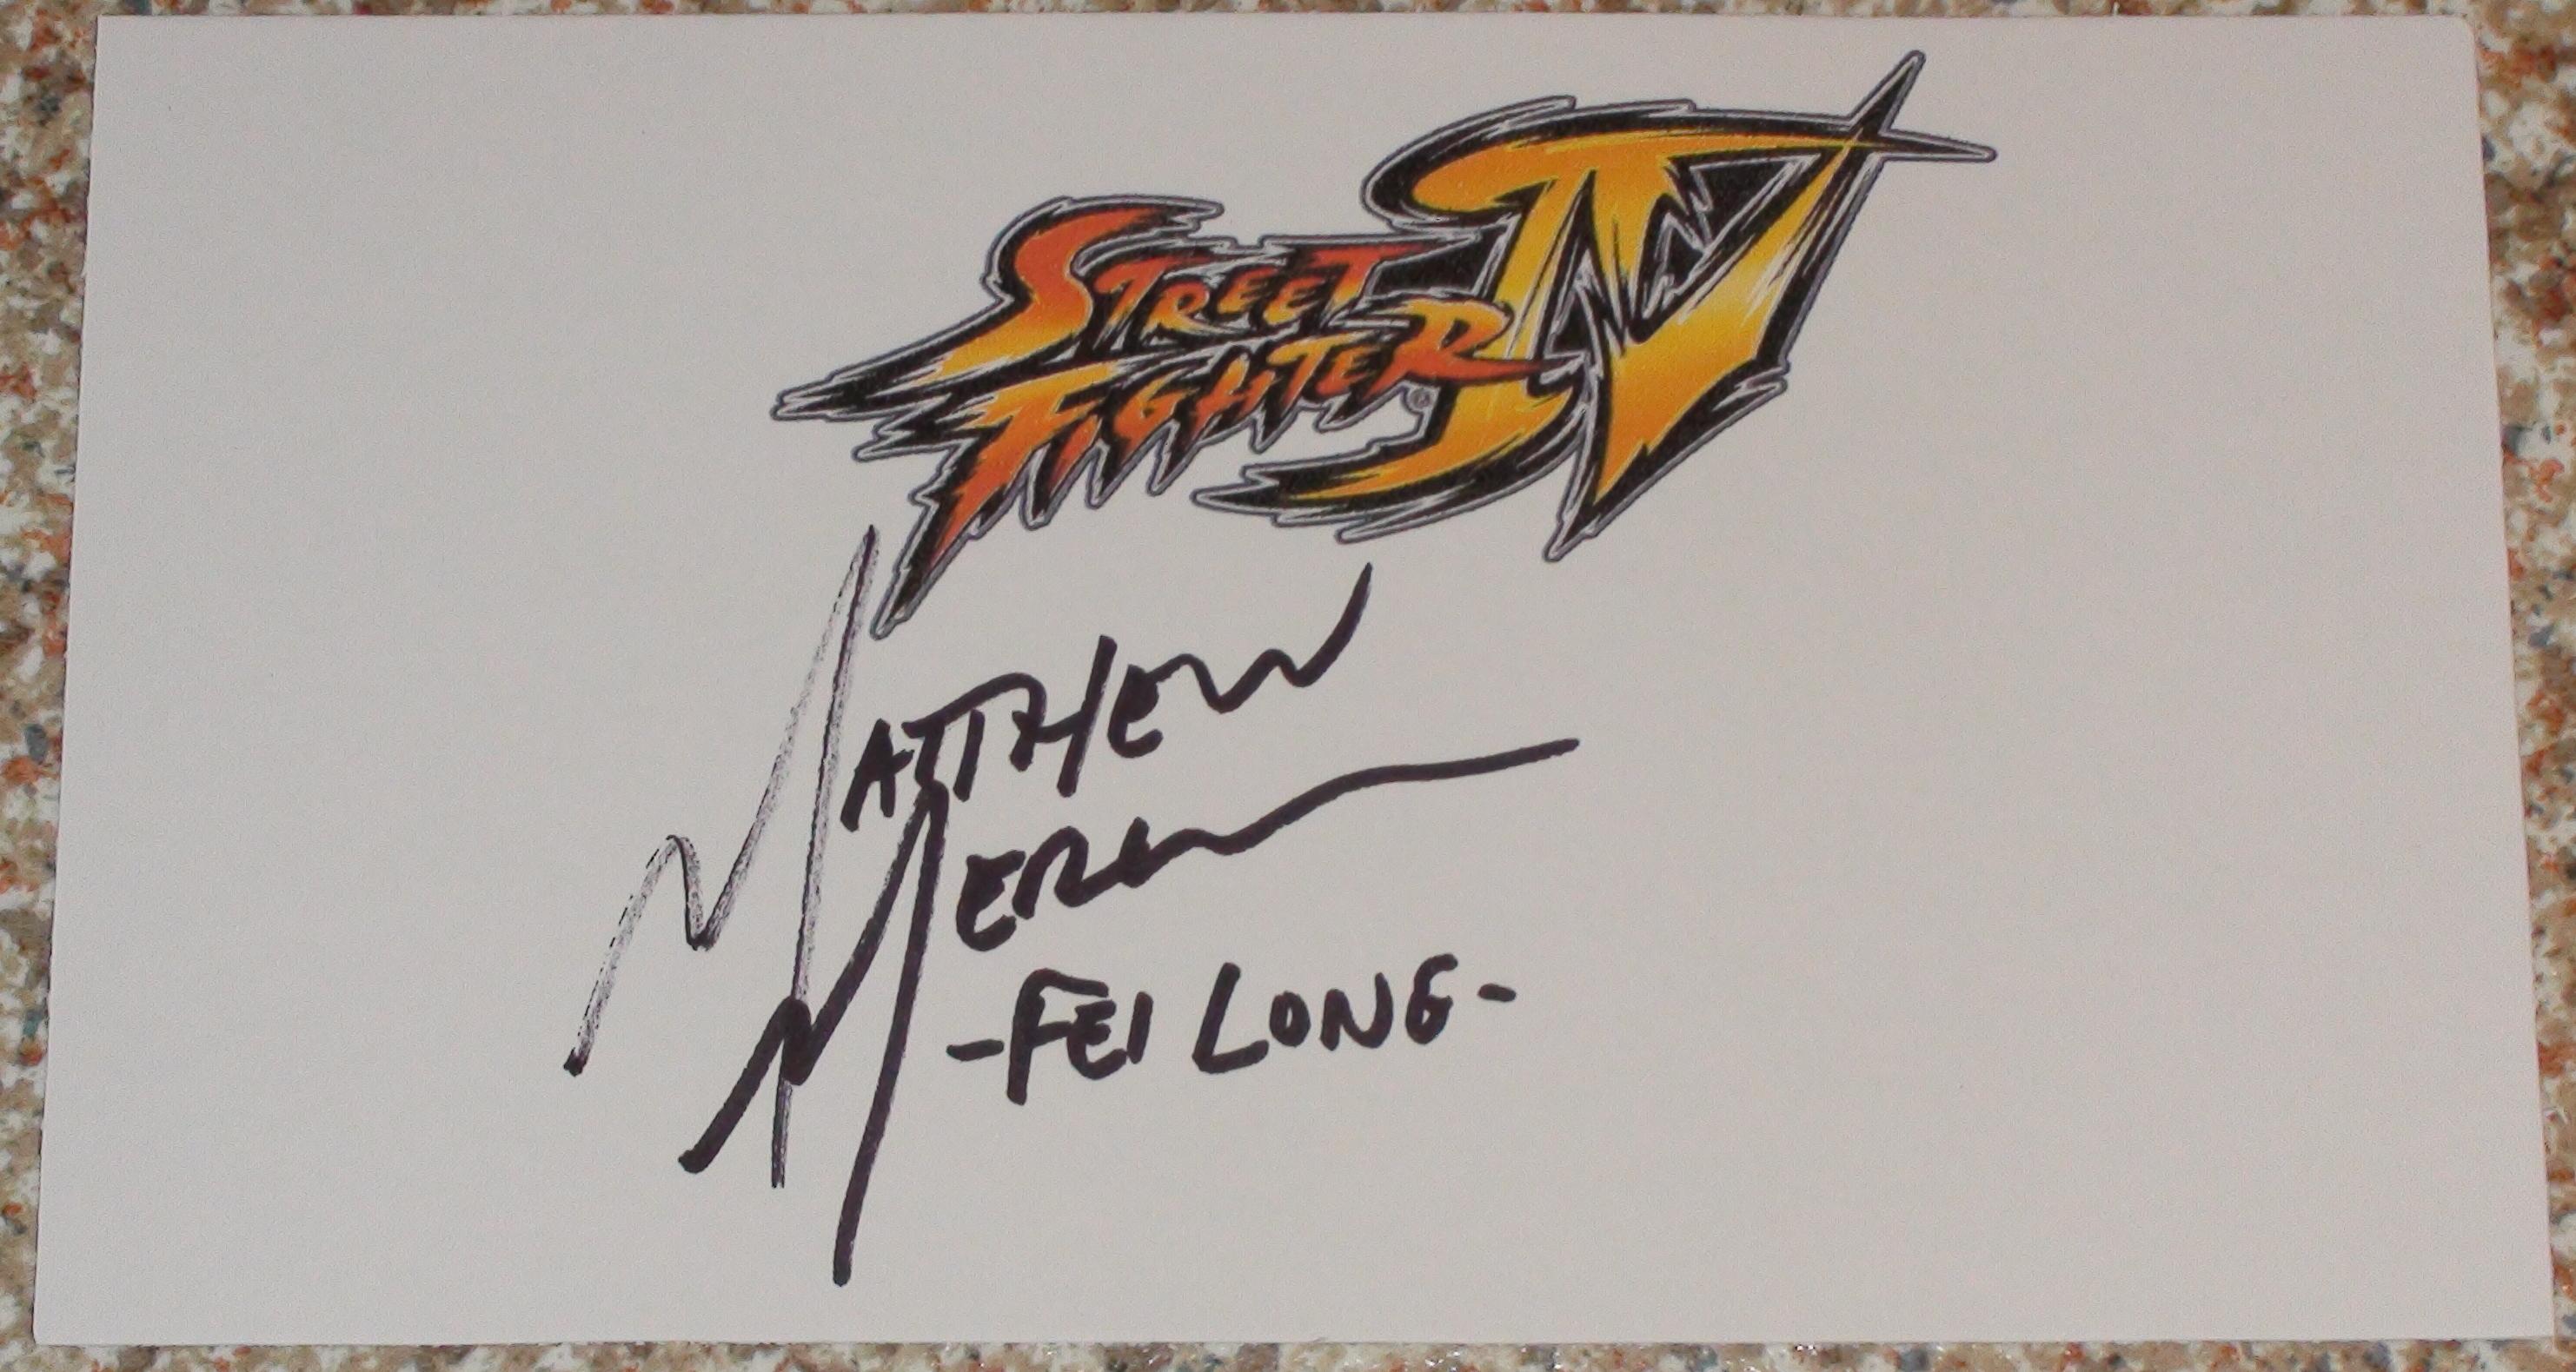 Street Fighter IV - Matthew Mercer